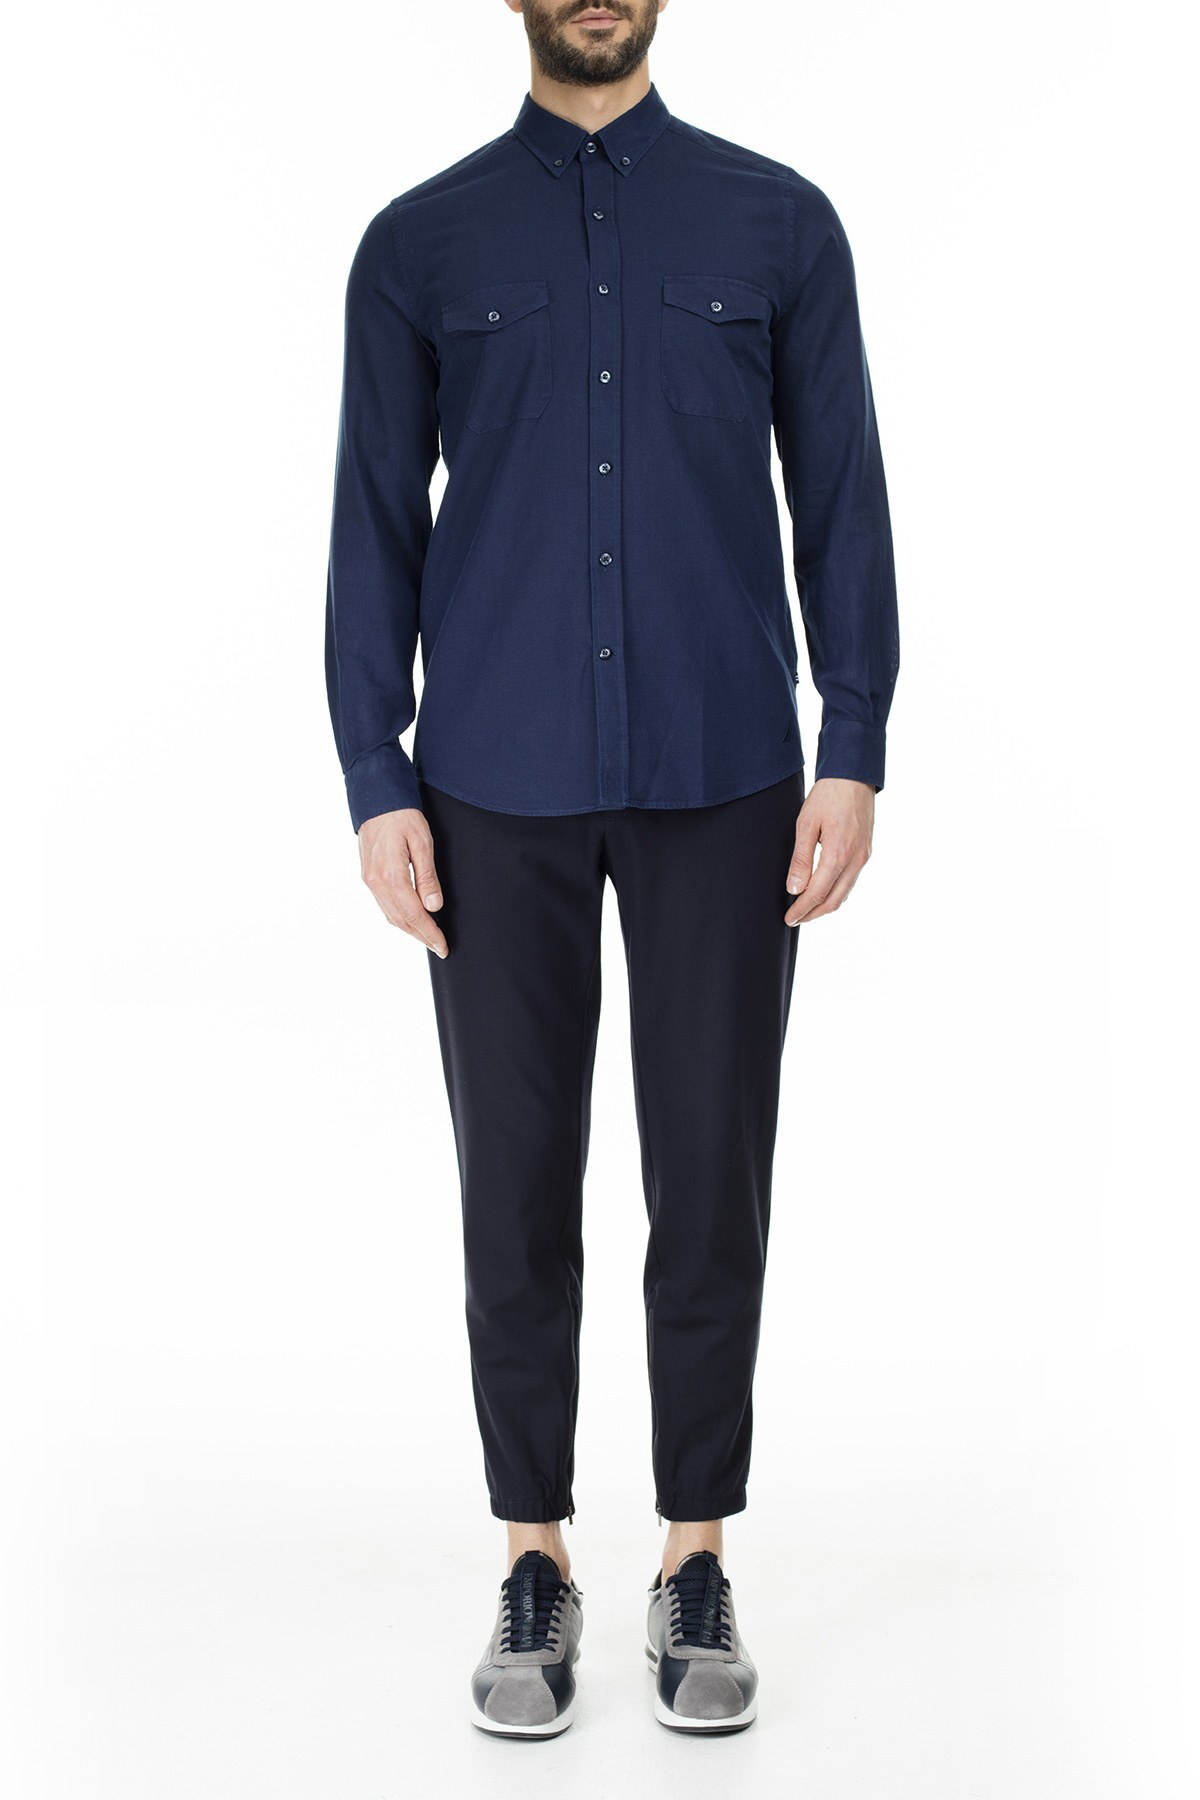 Nautica Slim Fit Erkek Gömlek W01036T 4ES MAVİ